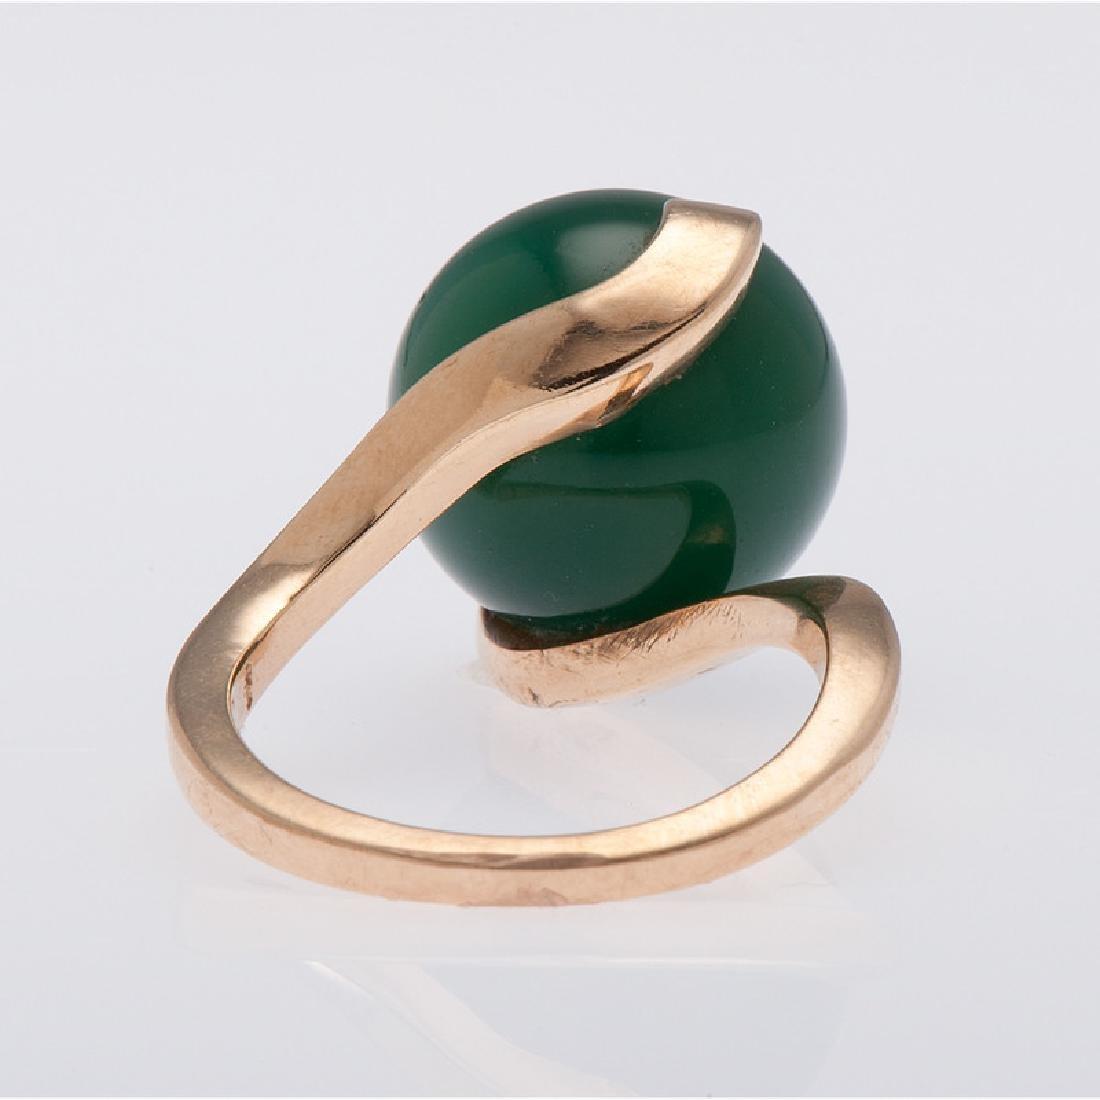 14 Karat Yellow Gold Green Onyx Ring - 2